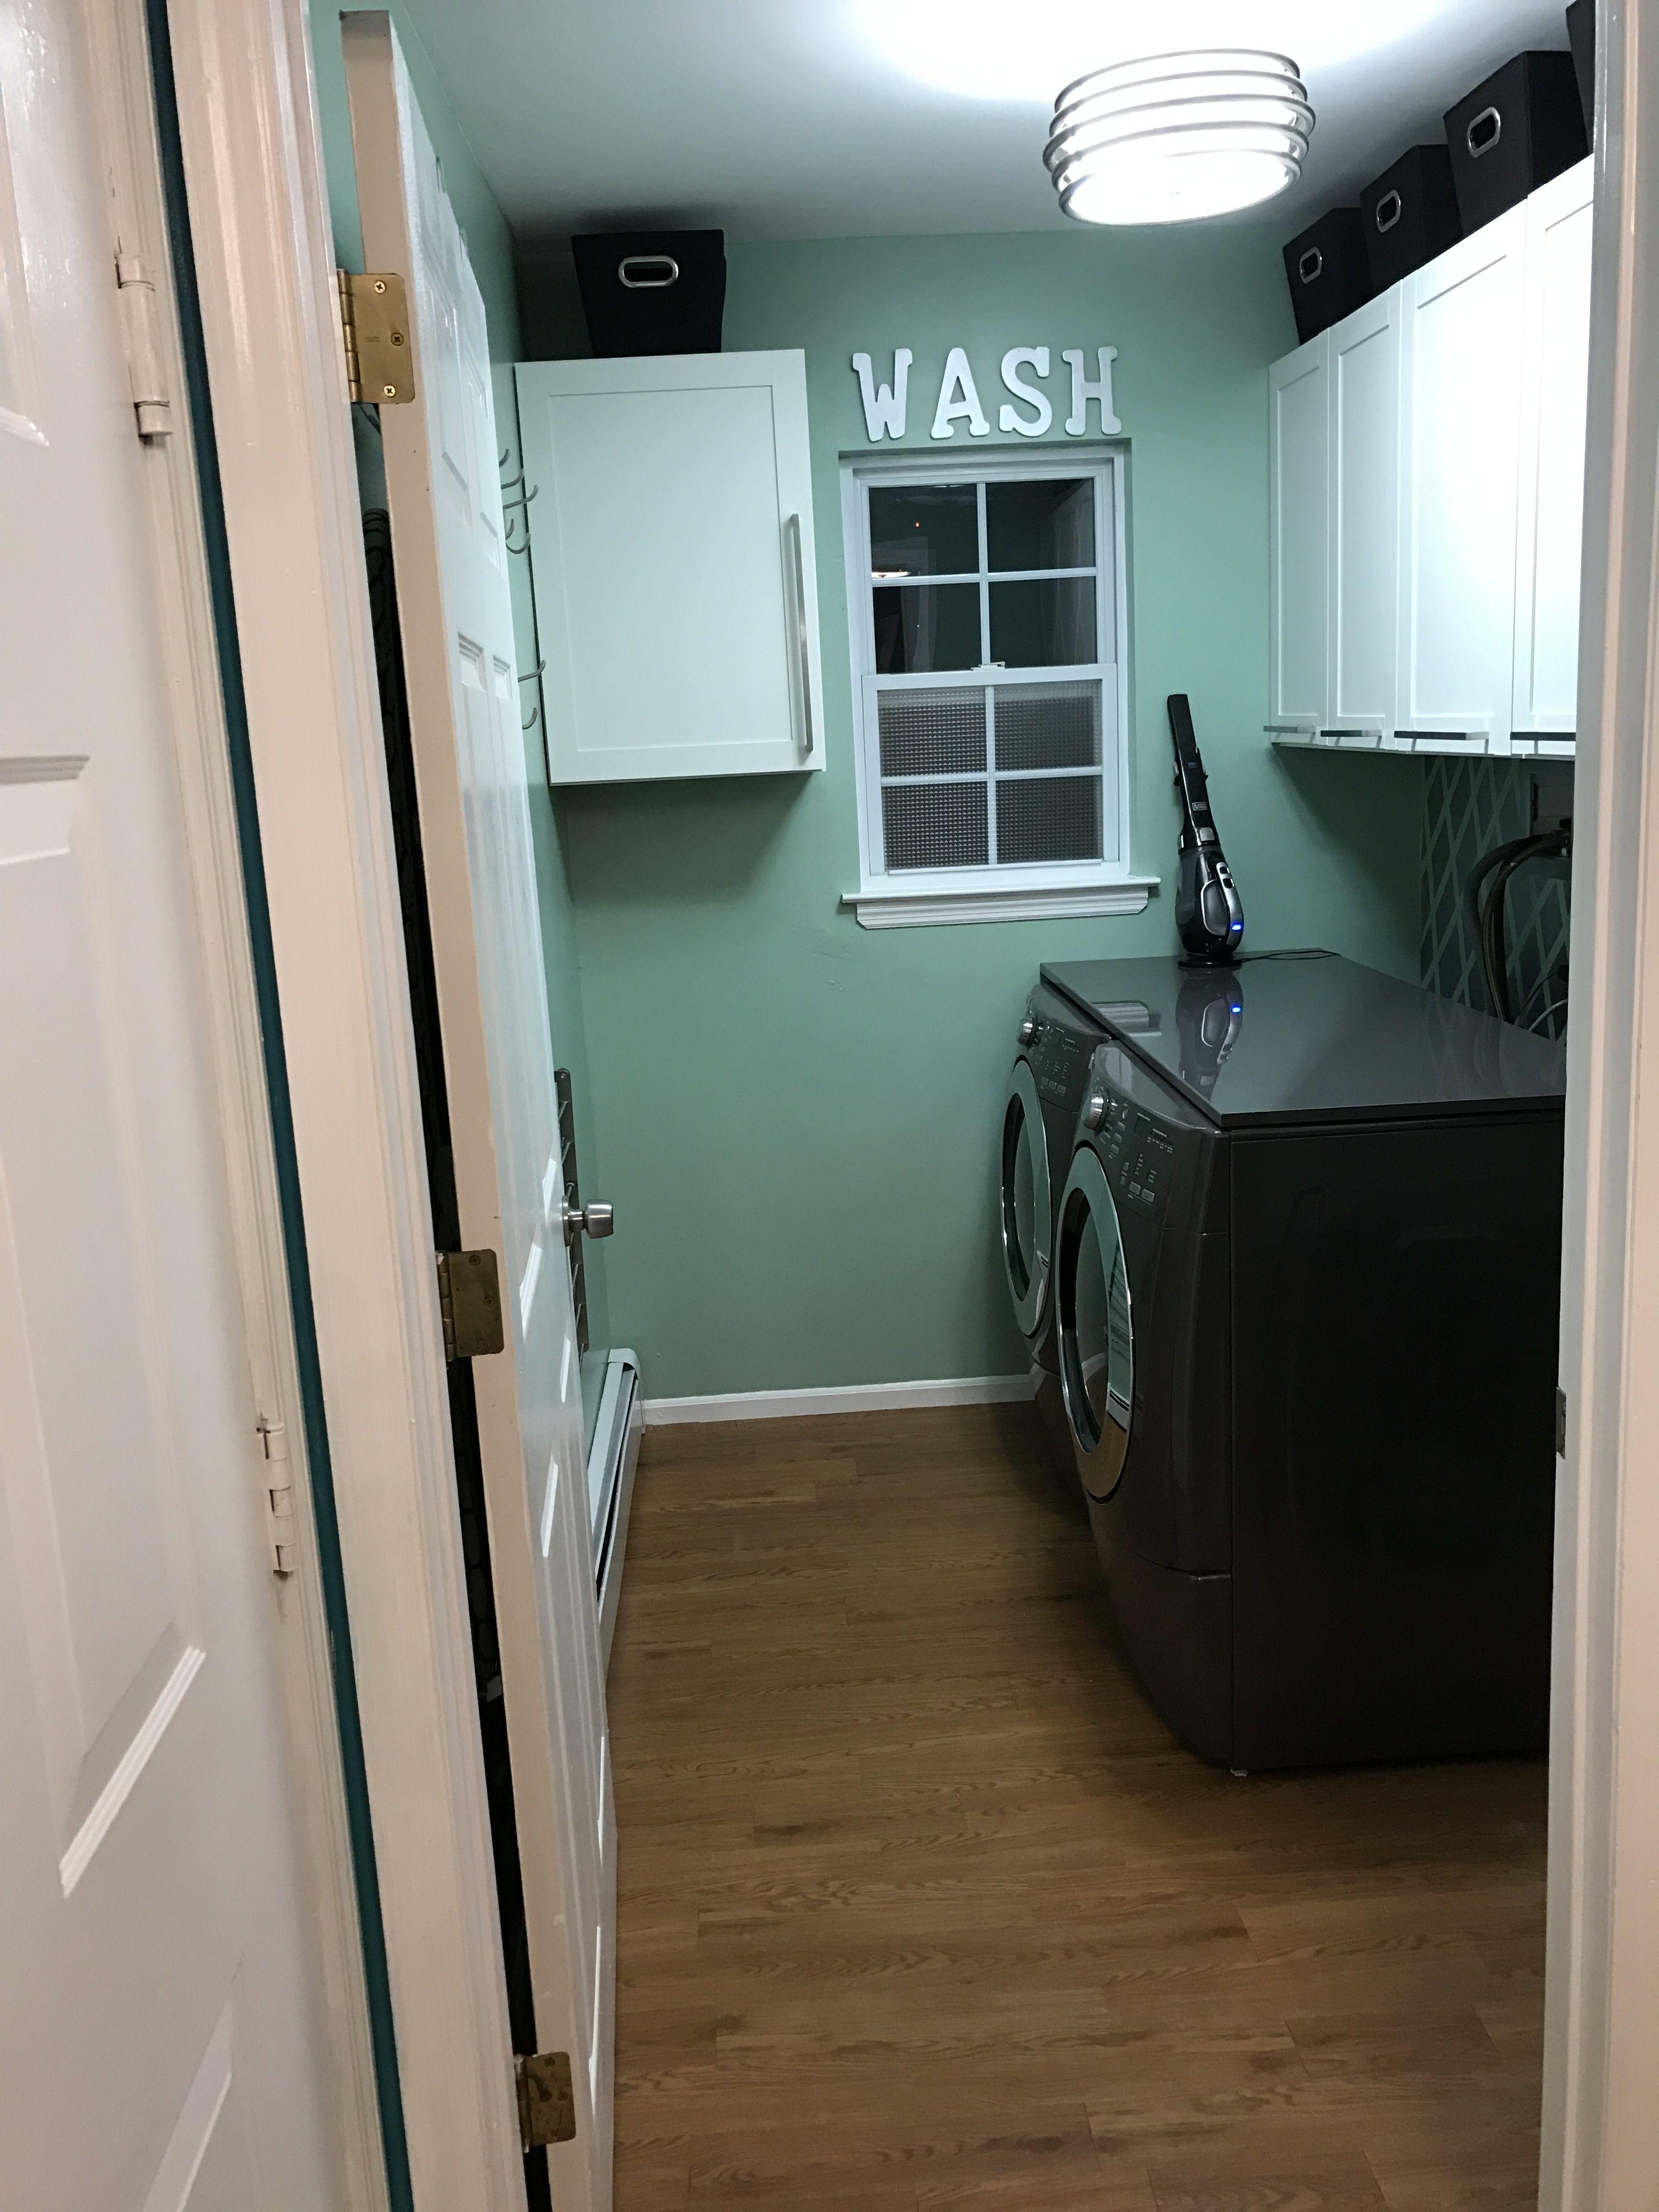 My Laundry room reno reveal, valspar \